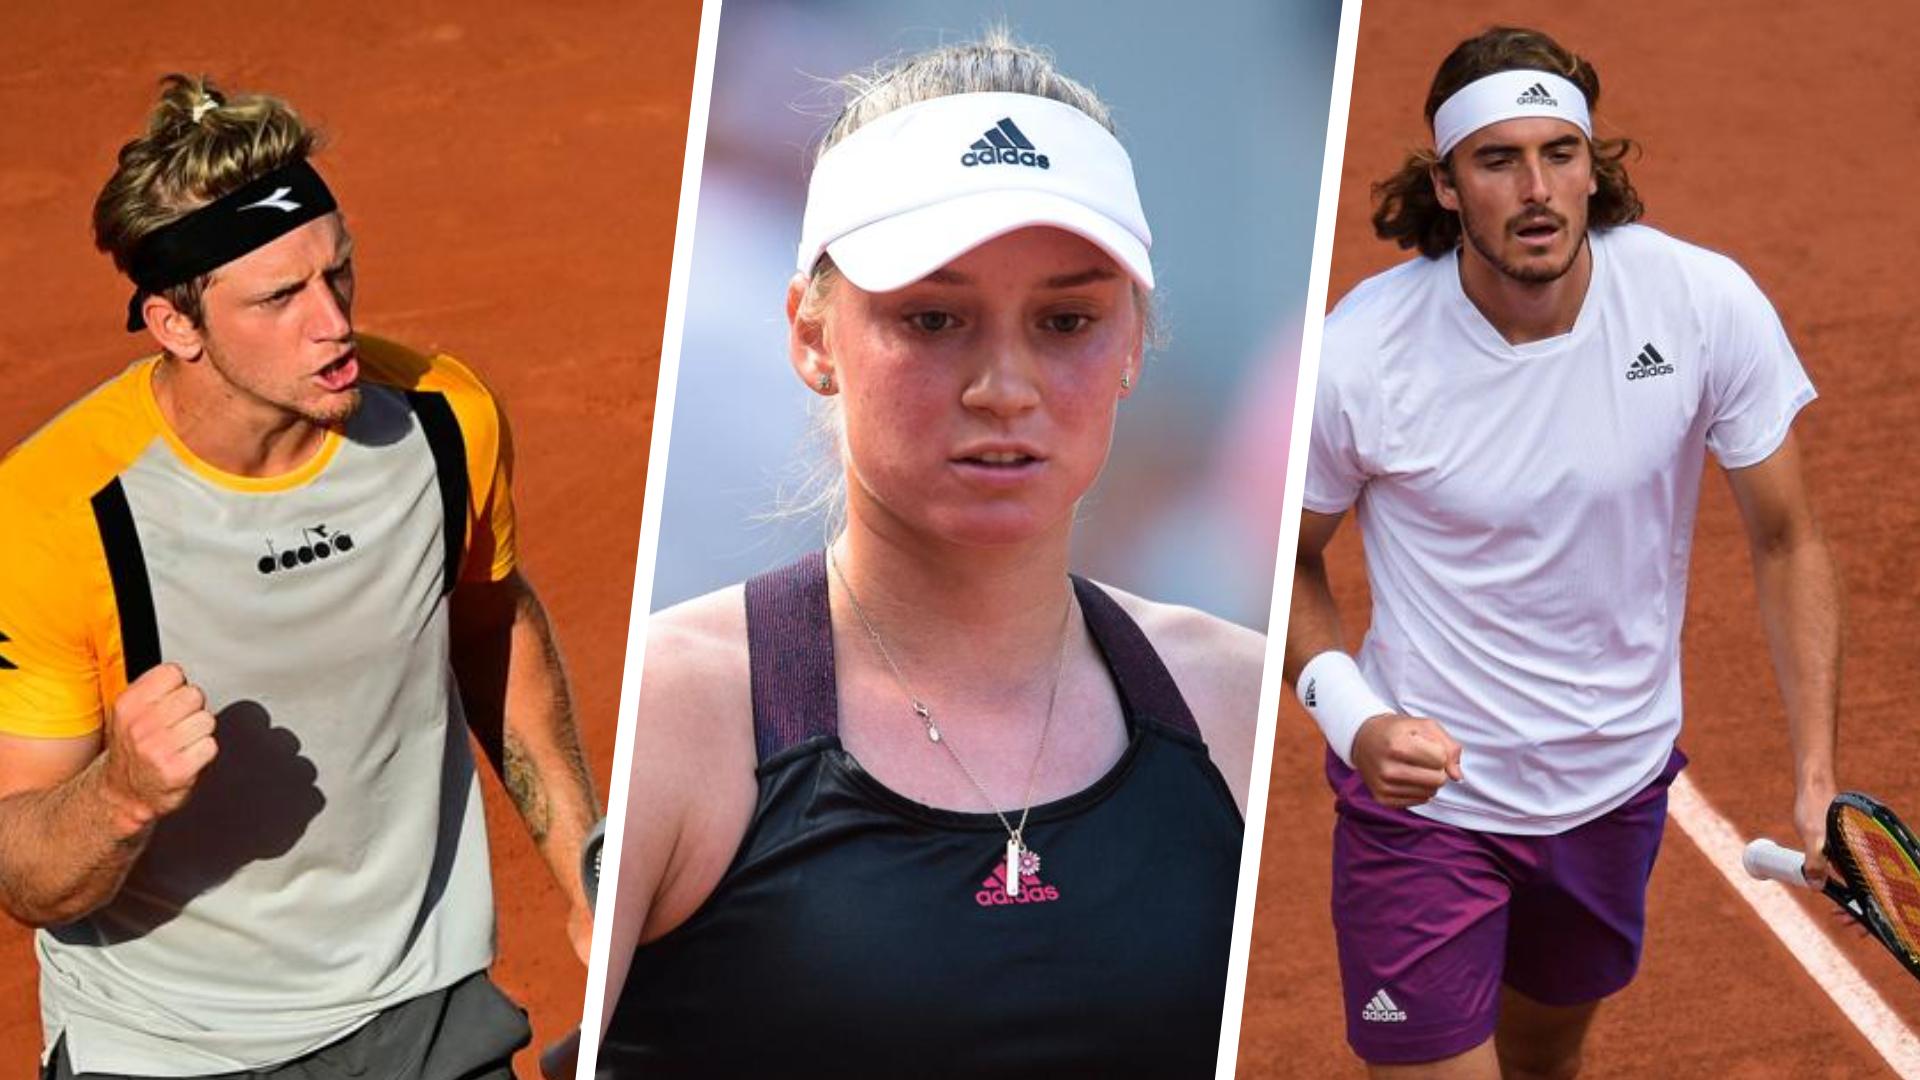 Tennis - Roland-Garros - Davidovich Fokina, Rybakina, Tsitsipas, : 5 raisons de suivre Roland-Garros ce mardi